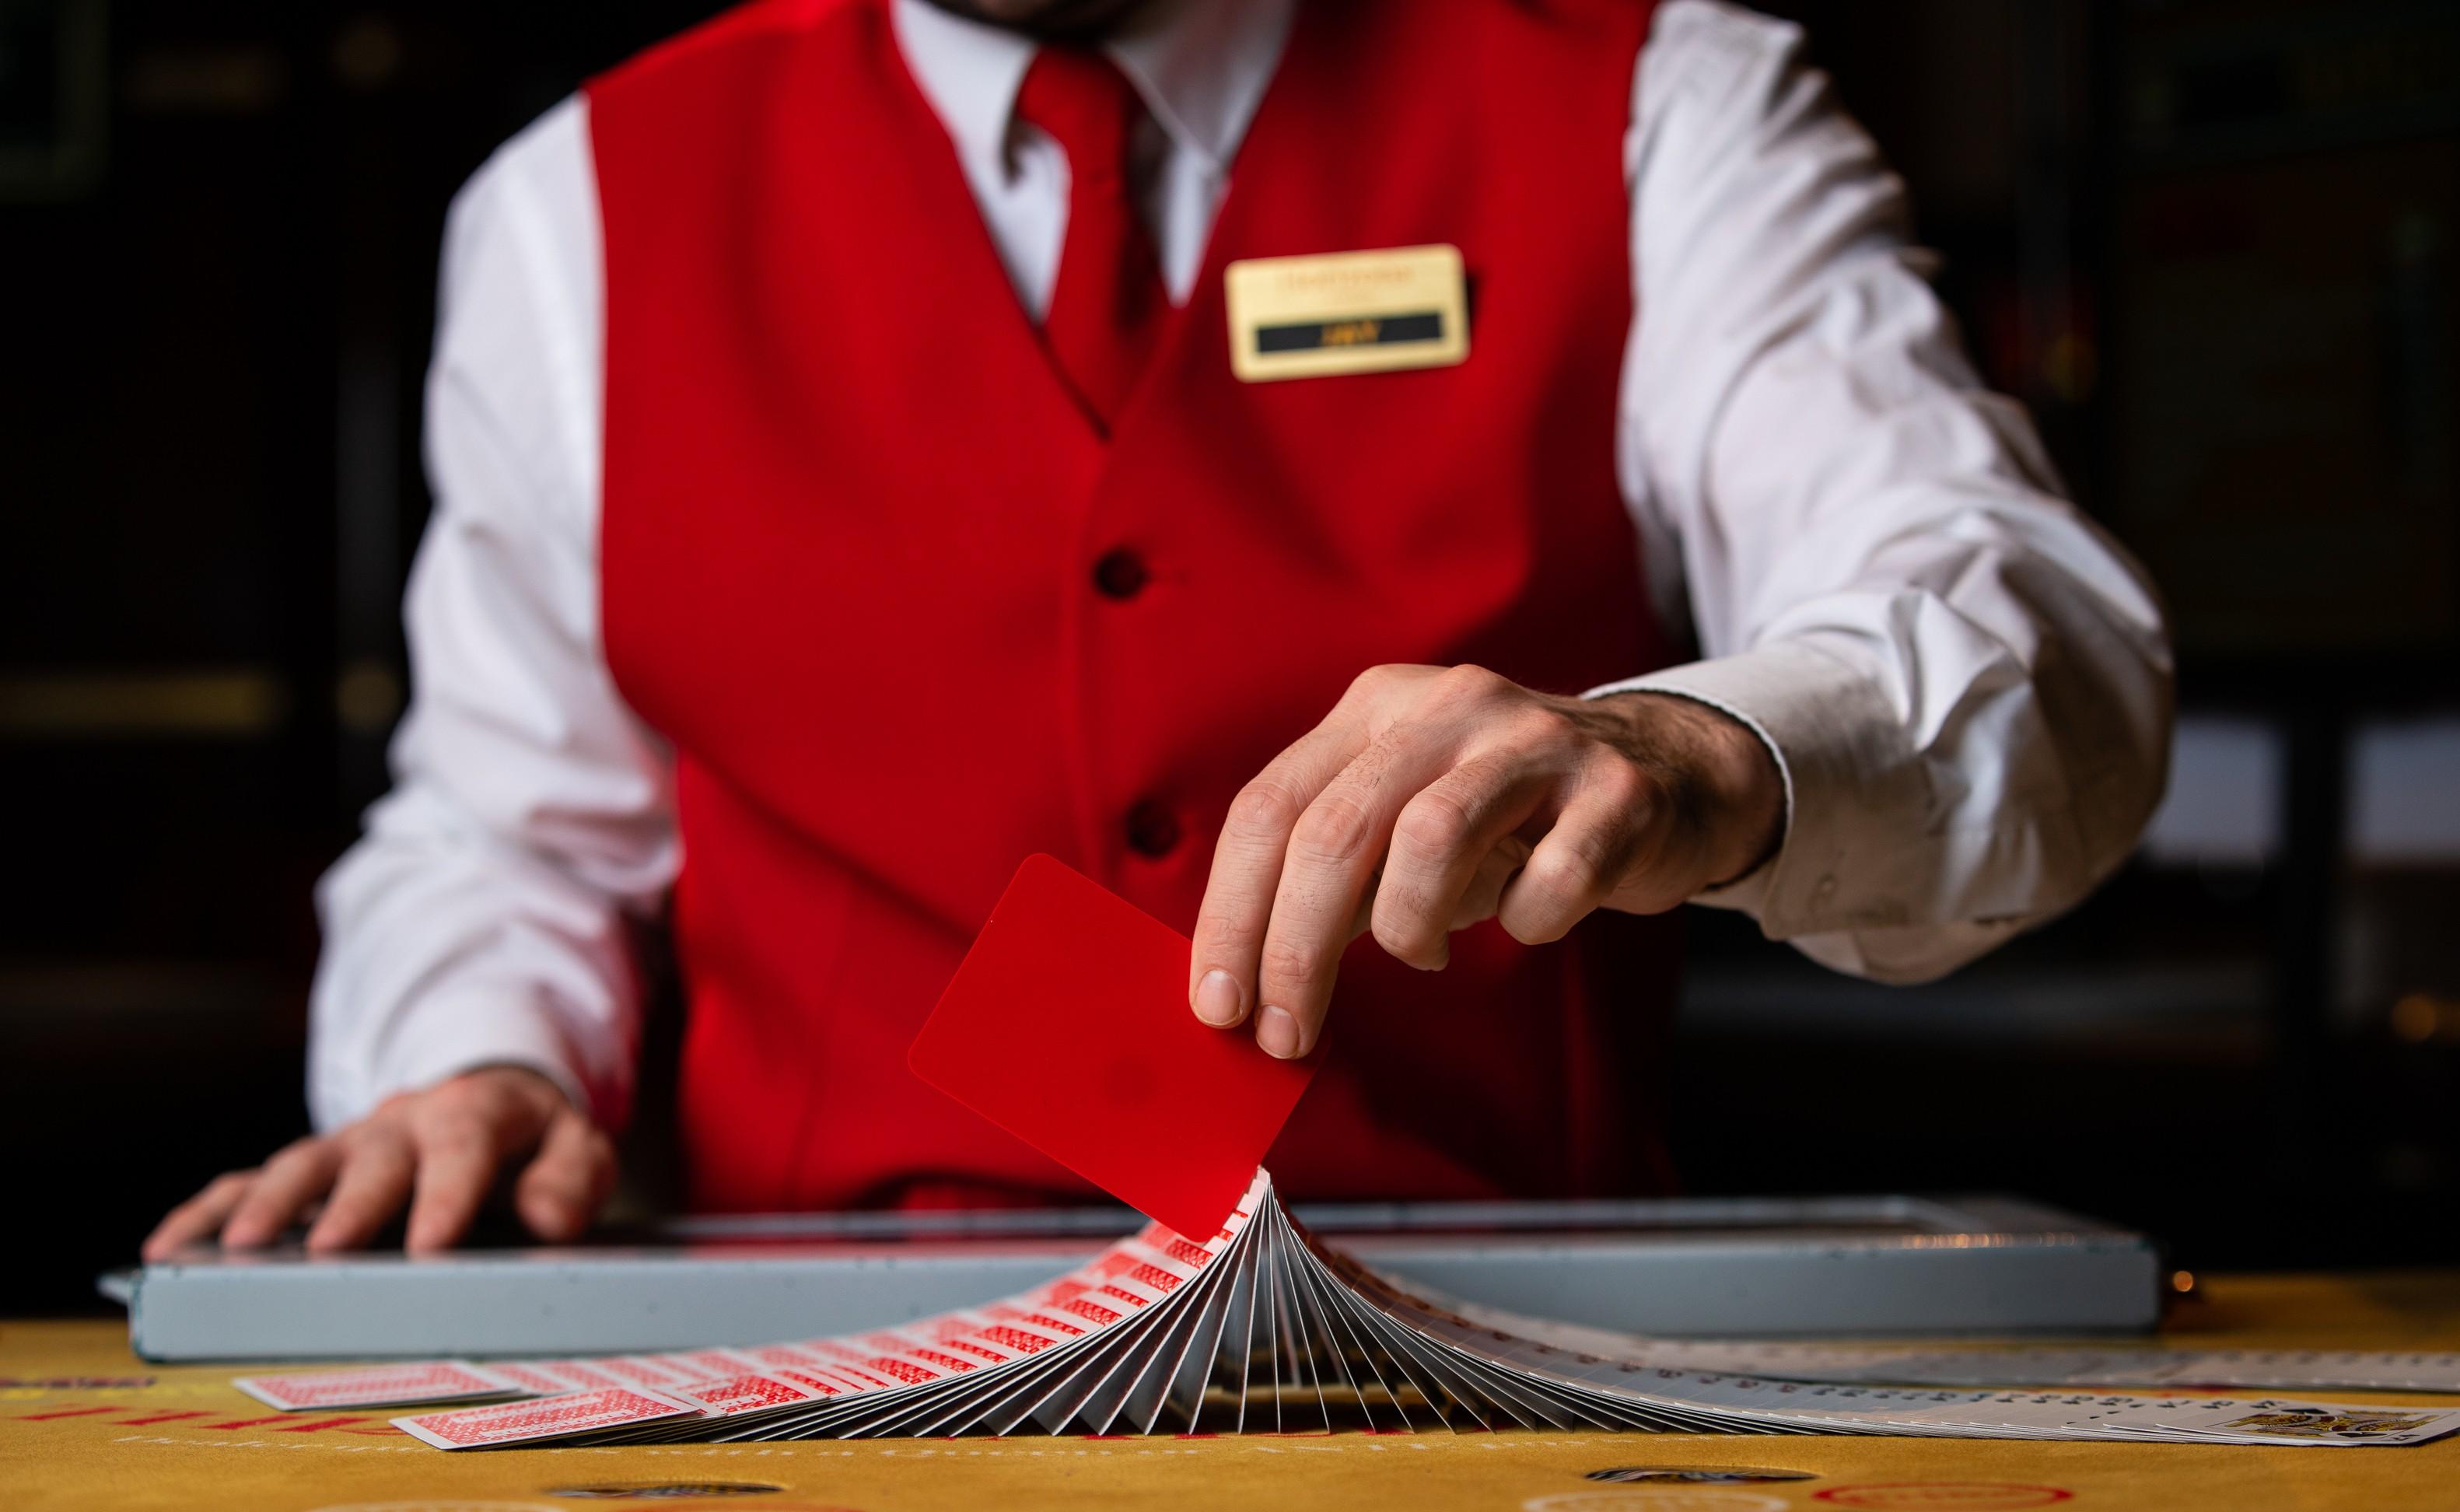 mayfair casinos